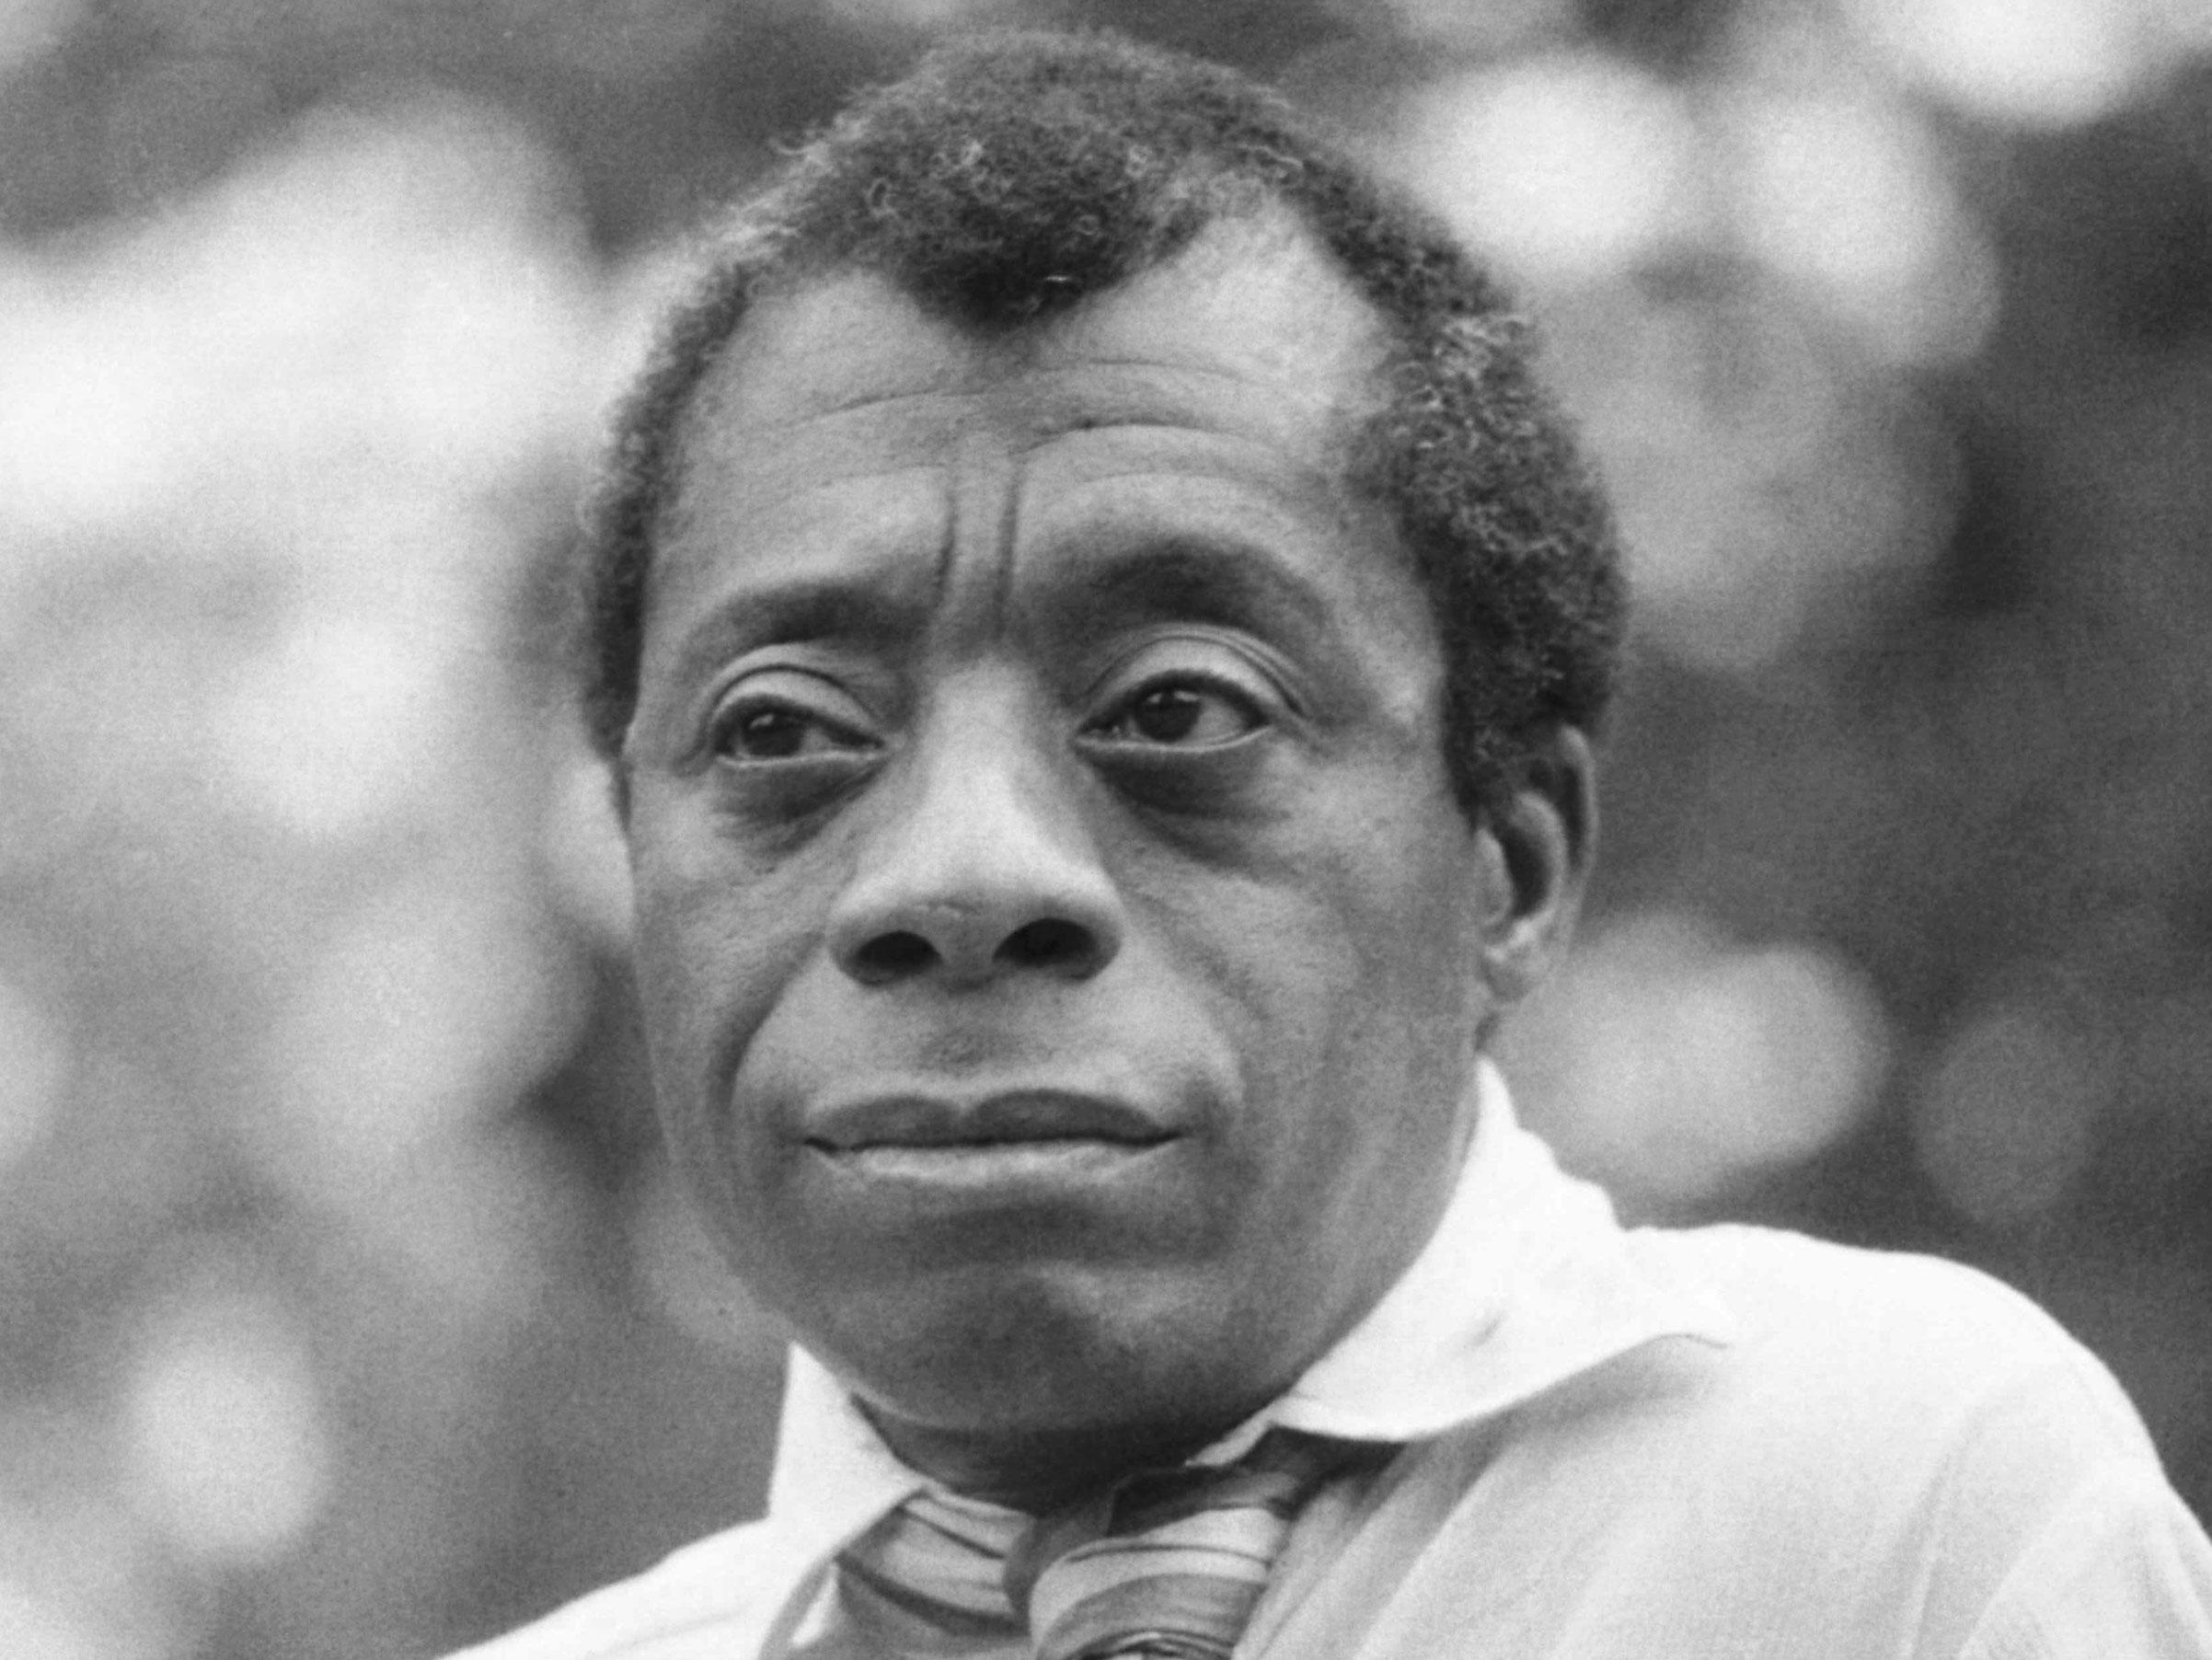 James Baldwin: The Making of an American Icon